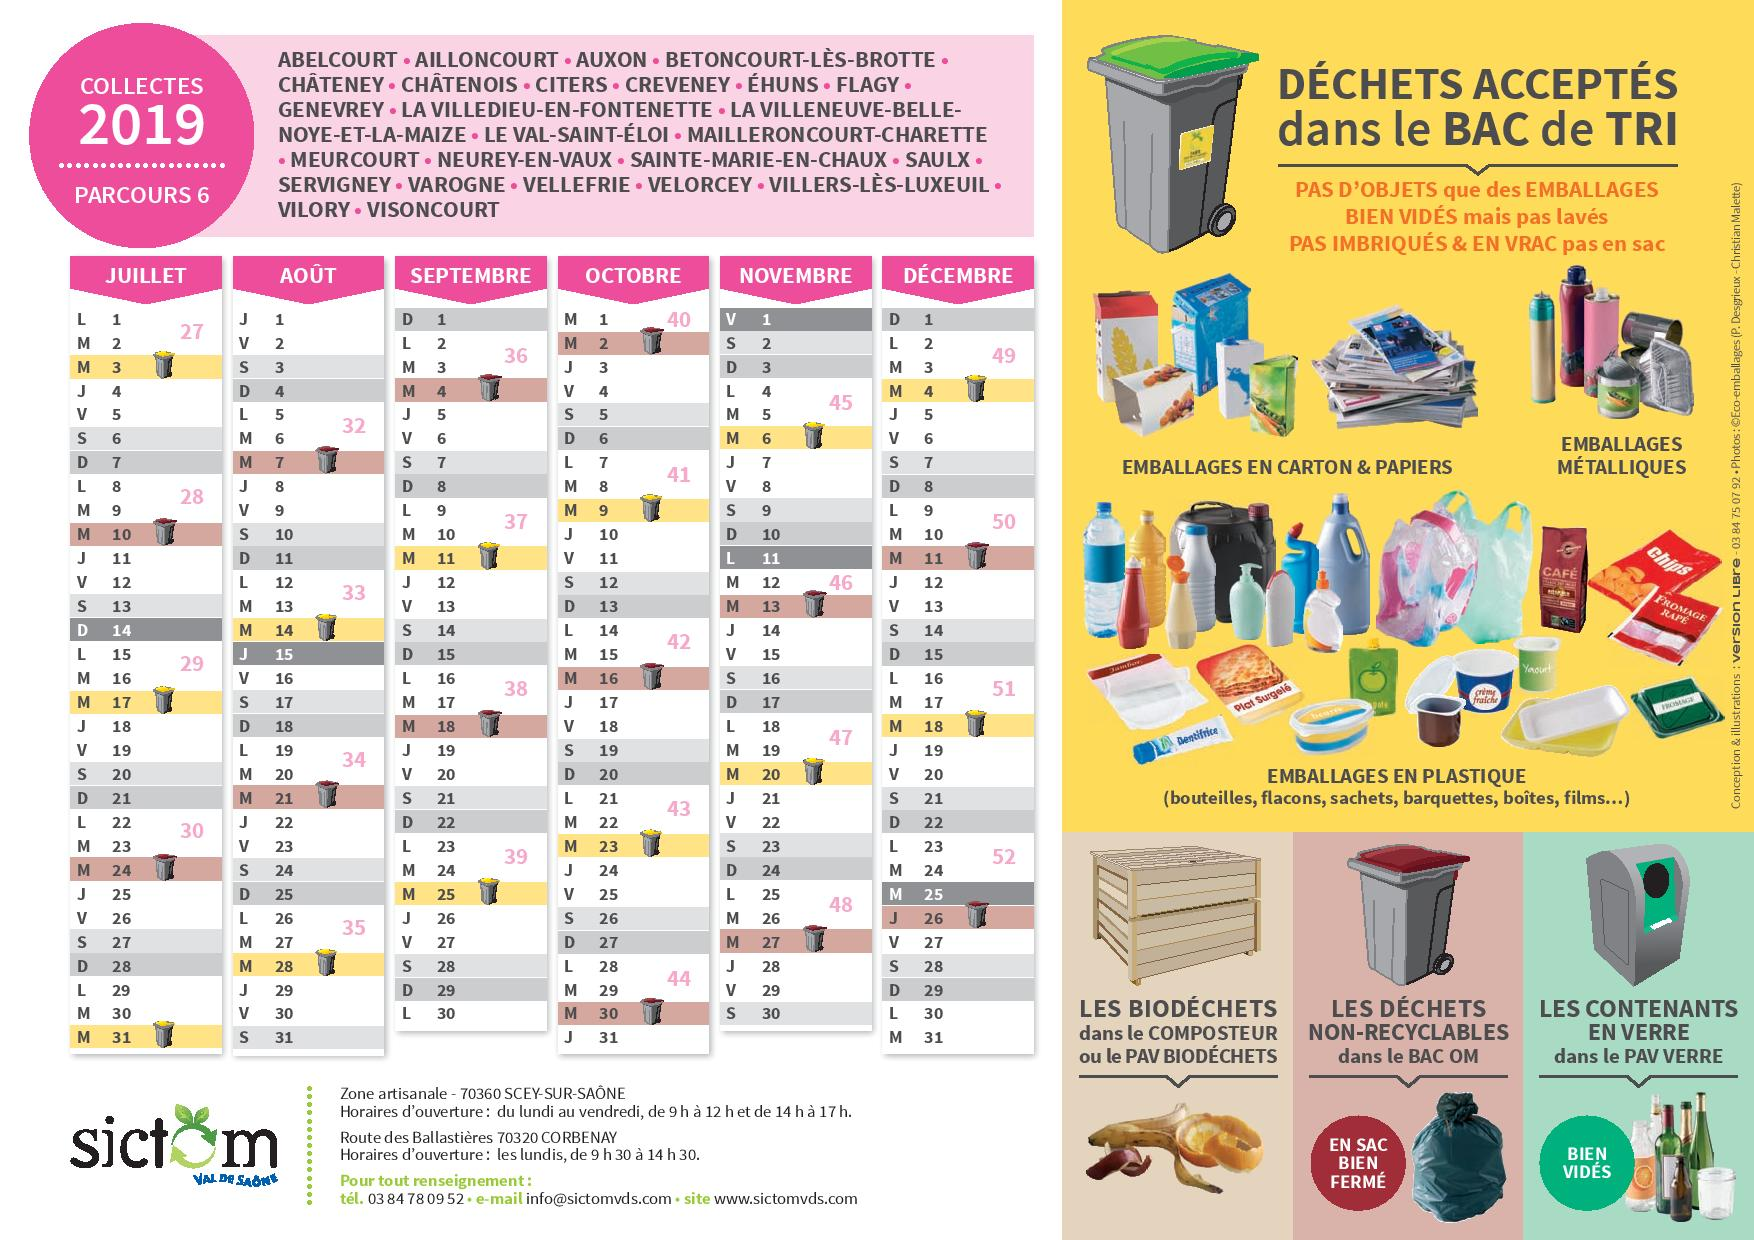 https://www.villers-les-luxeuil.com/projets/villers/files/images/2019_Mairie/divers/CALENDRIER_6_BAT2_page_002.jpg